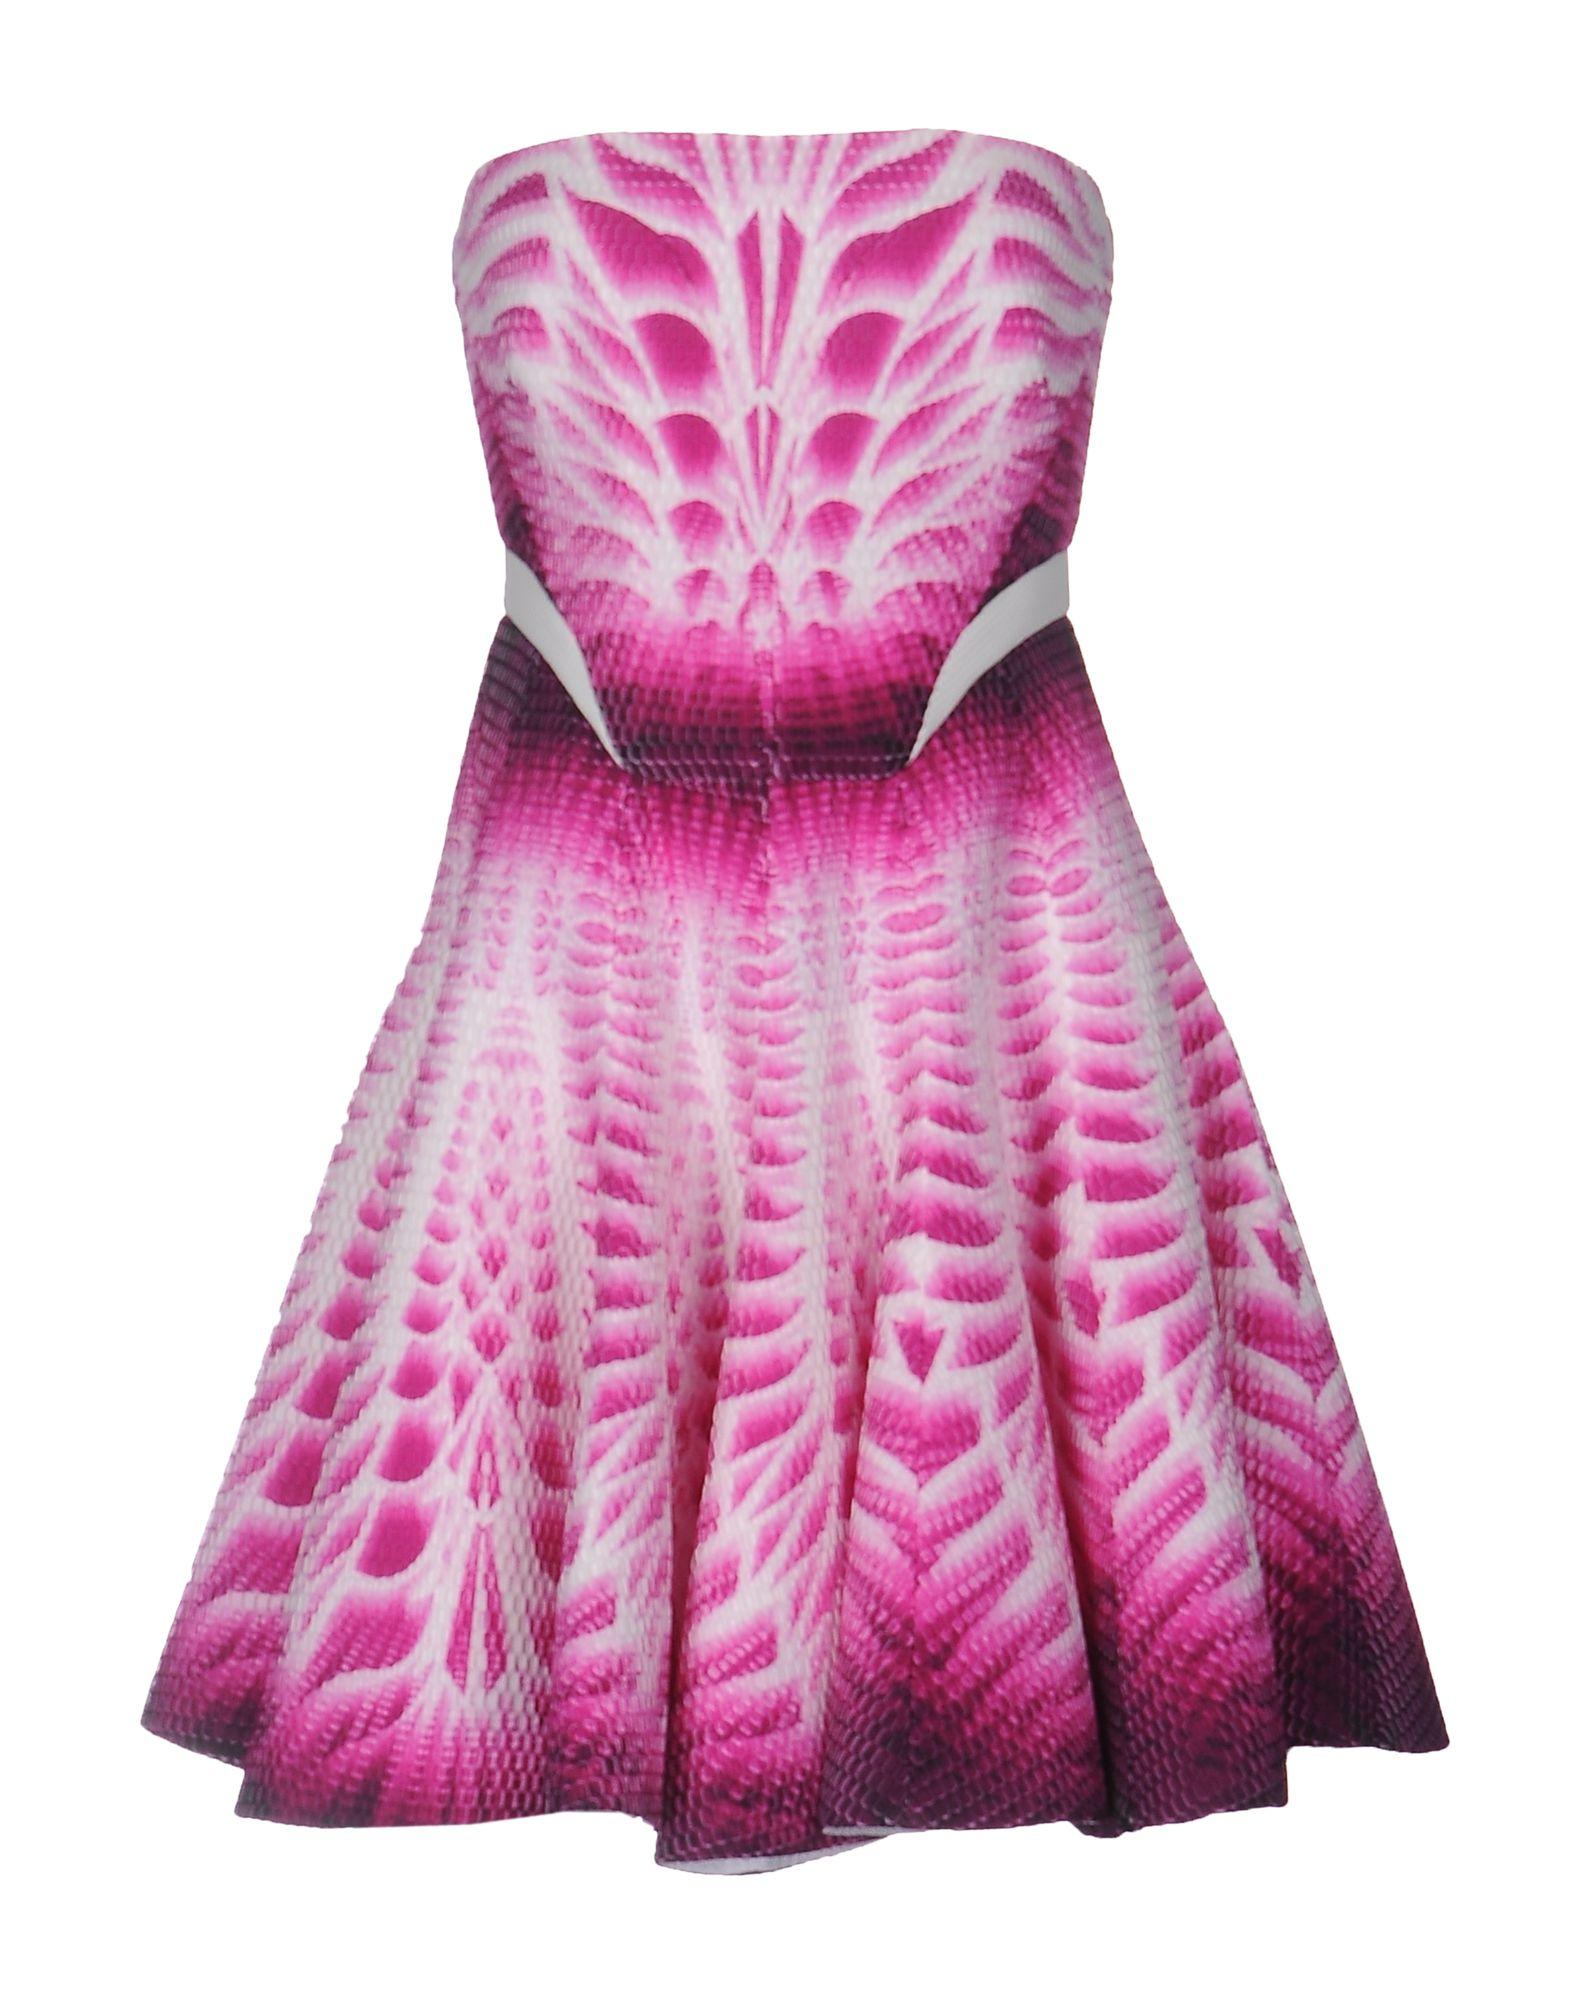 MANUEL FACCHINI Short Dresses in Fuchsia